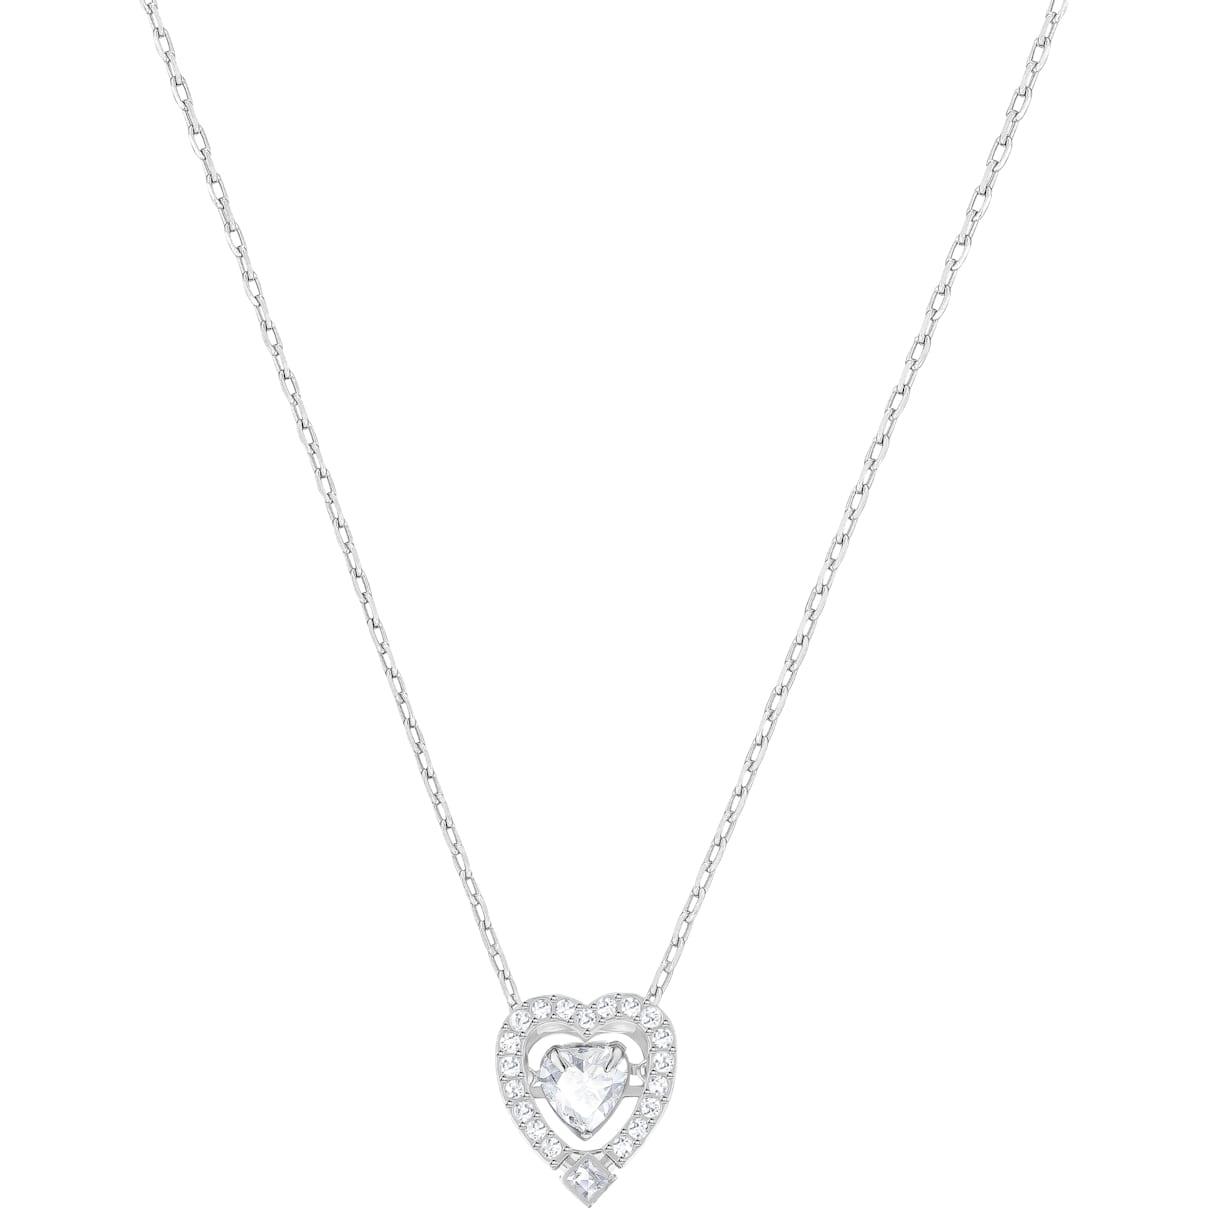 Swarovski Swarovski Sparkling Dance Heart Necklace, White, Rhodium plated